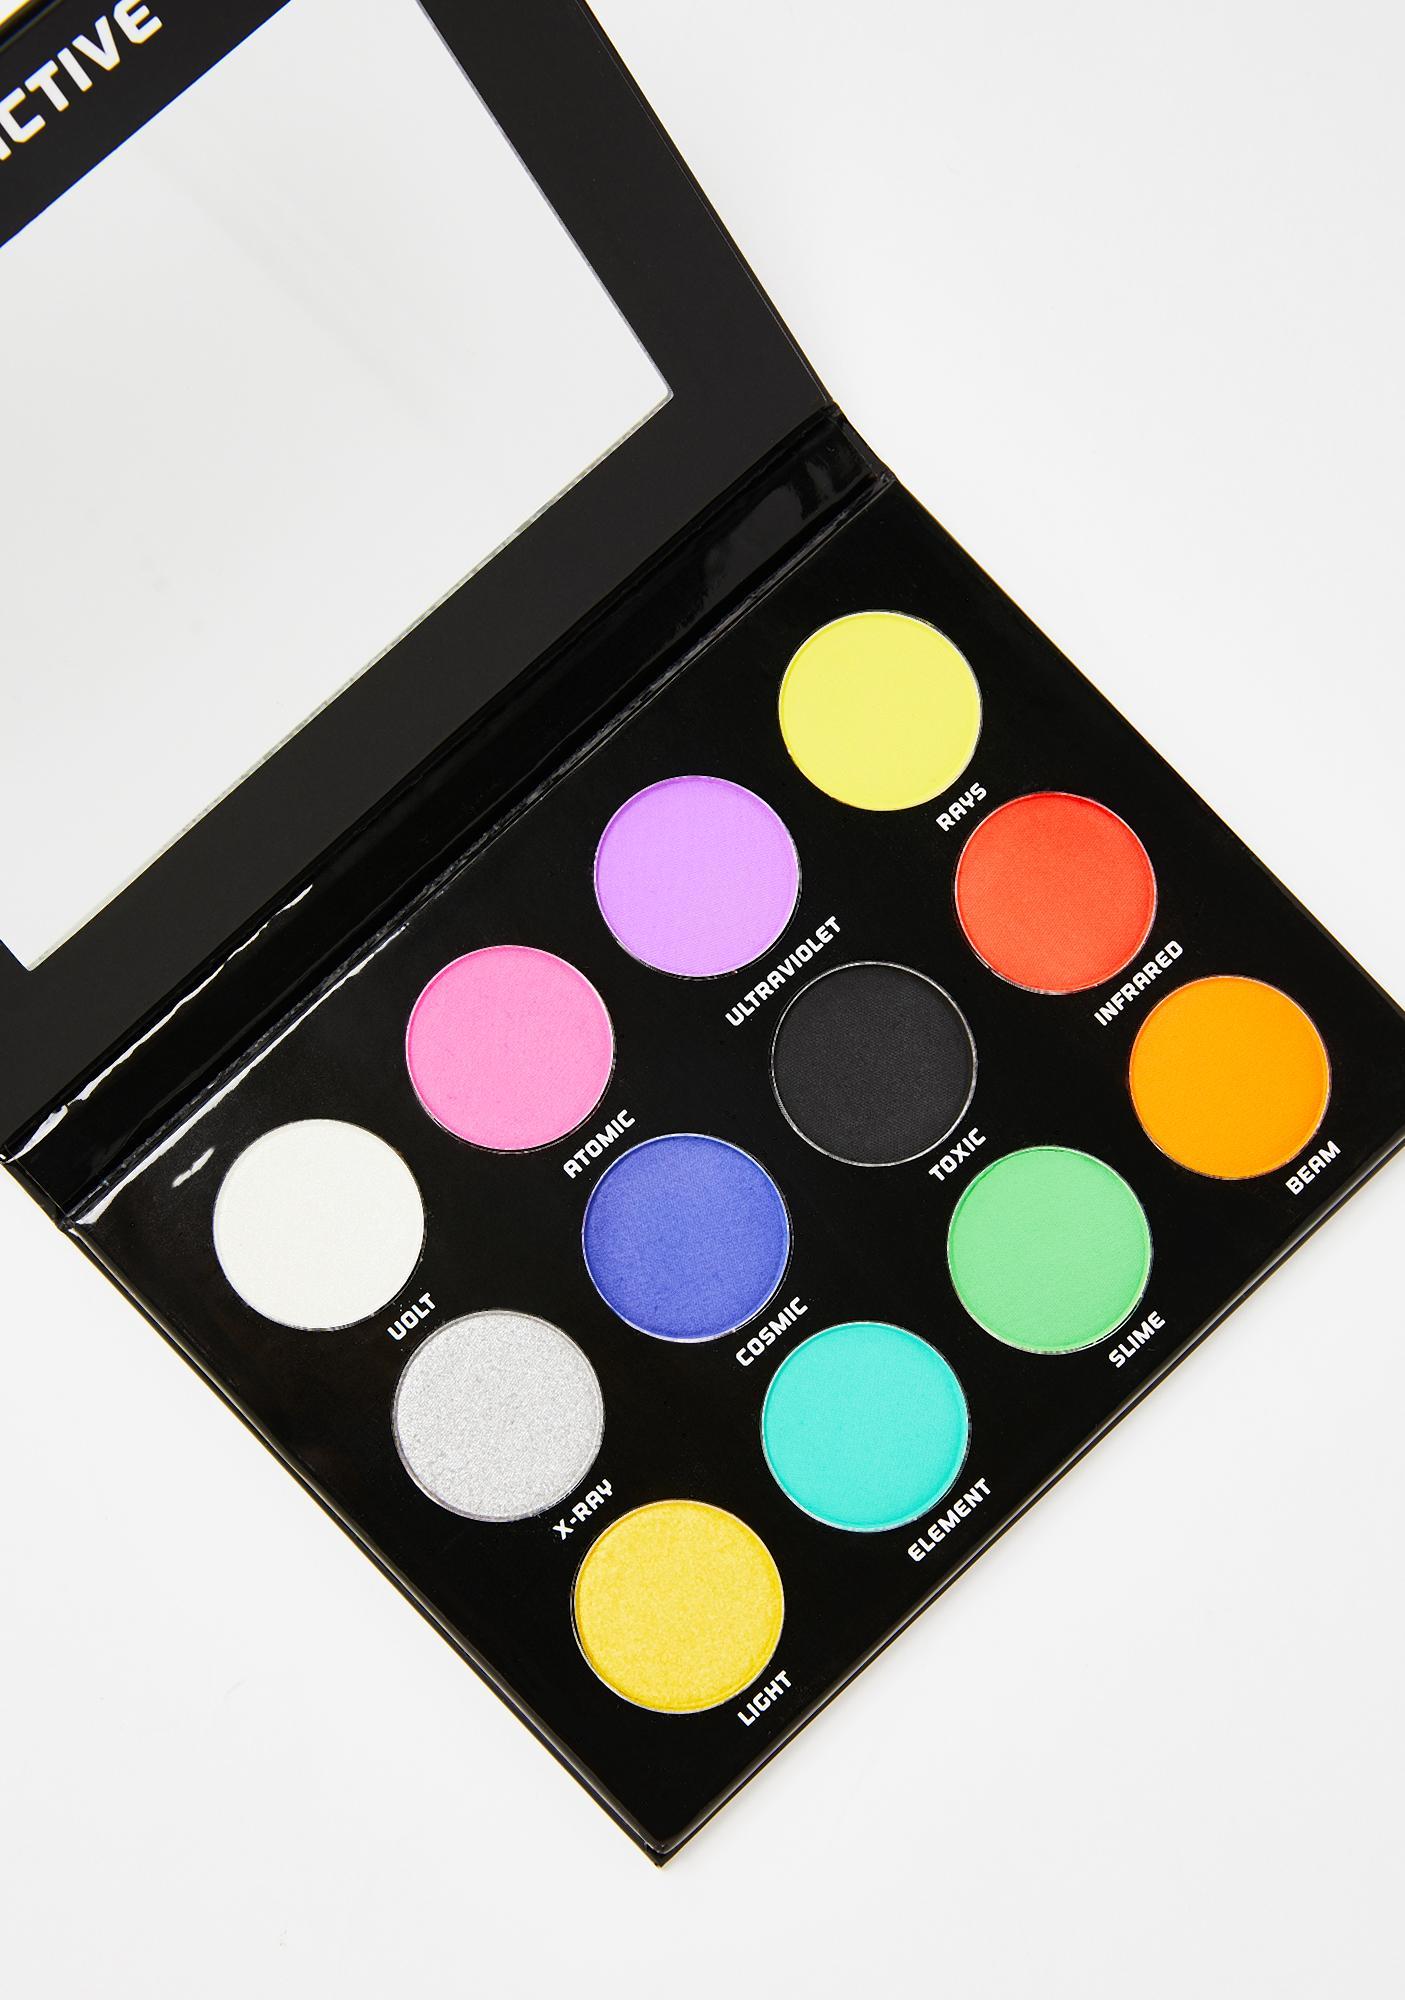 Melolops Radioactive Eyeshadow Palette